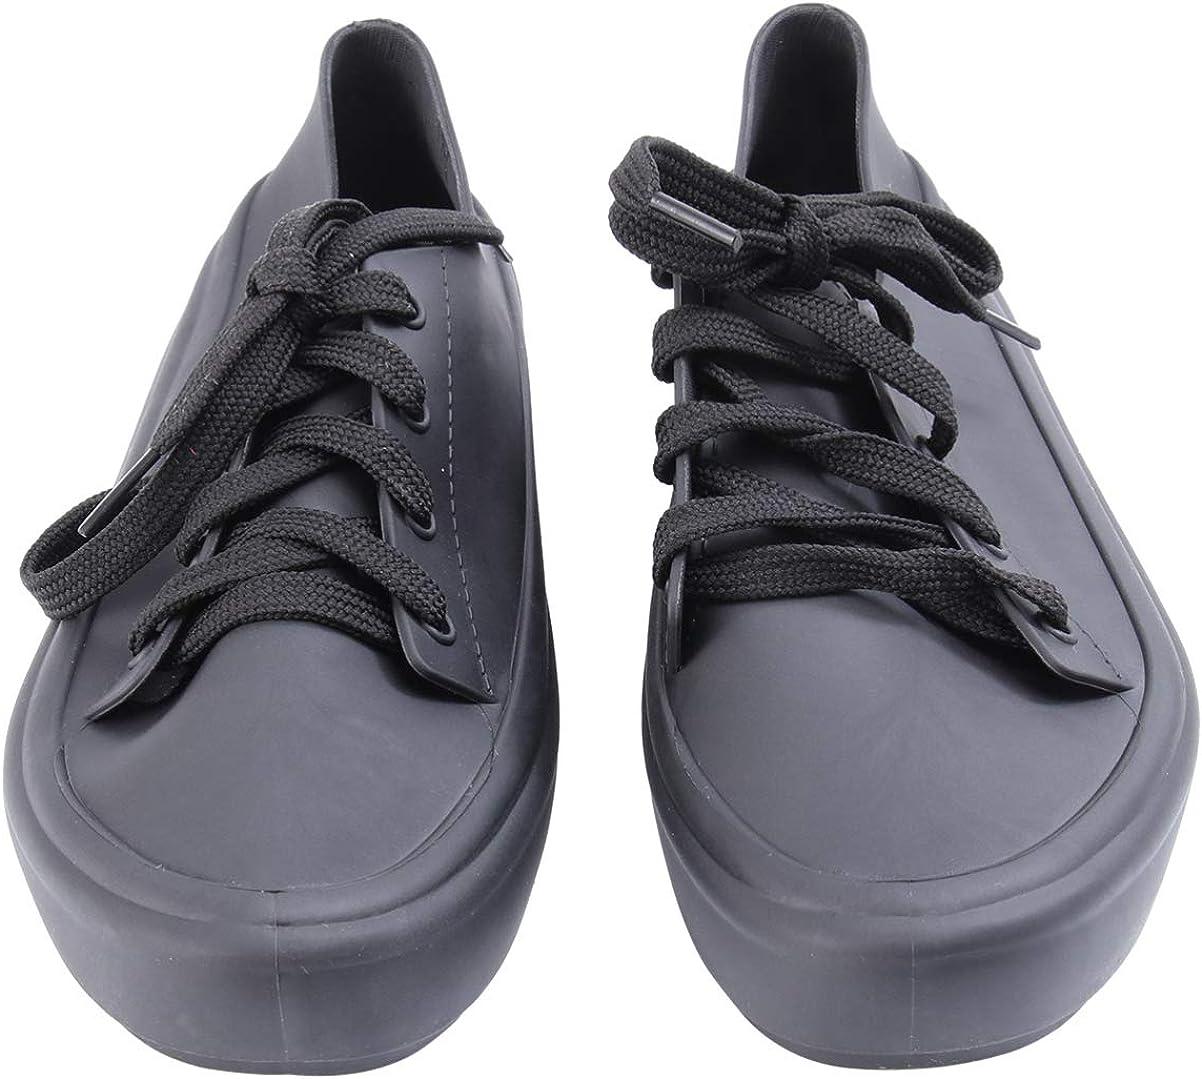 Walking Shoes Waterproof Skate Shoe